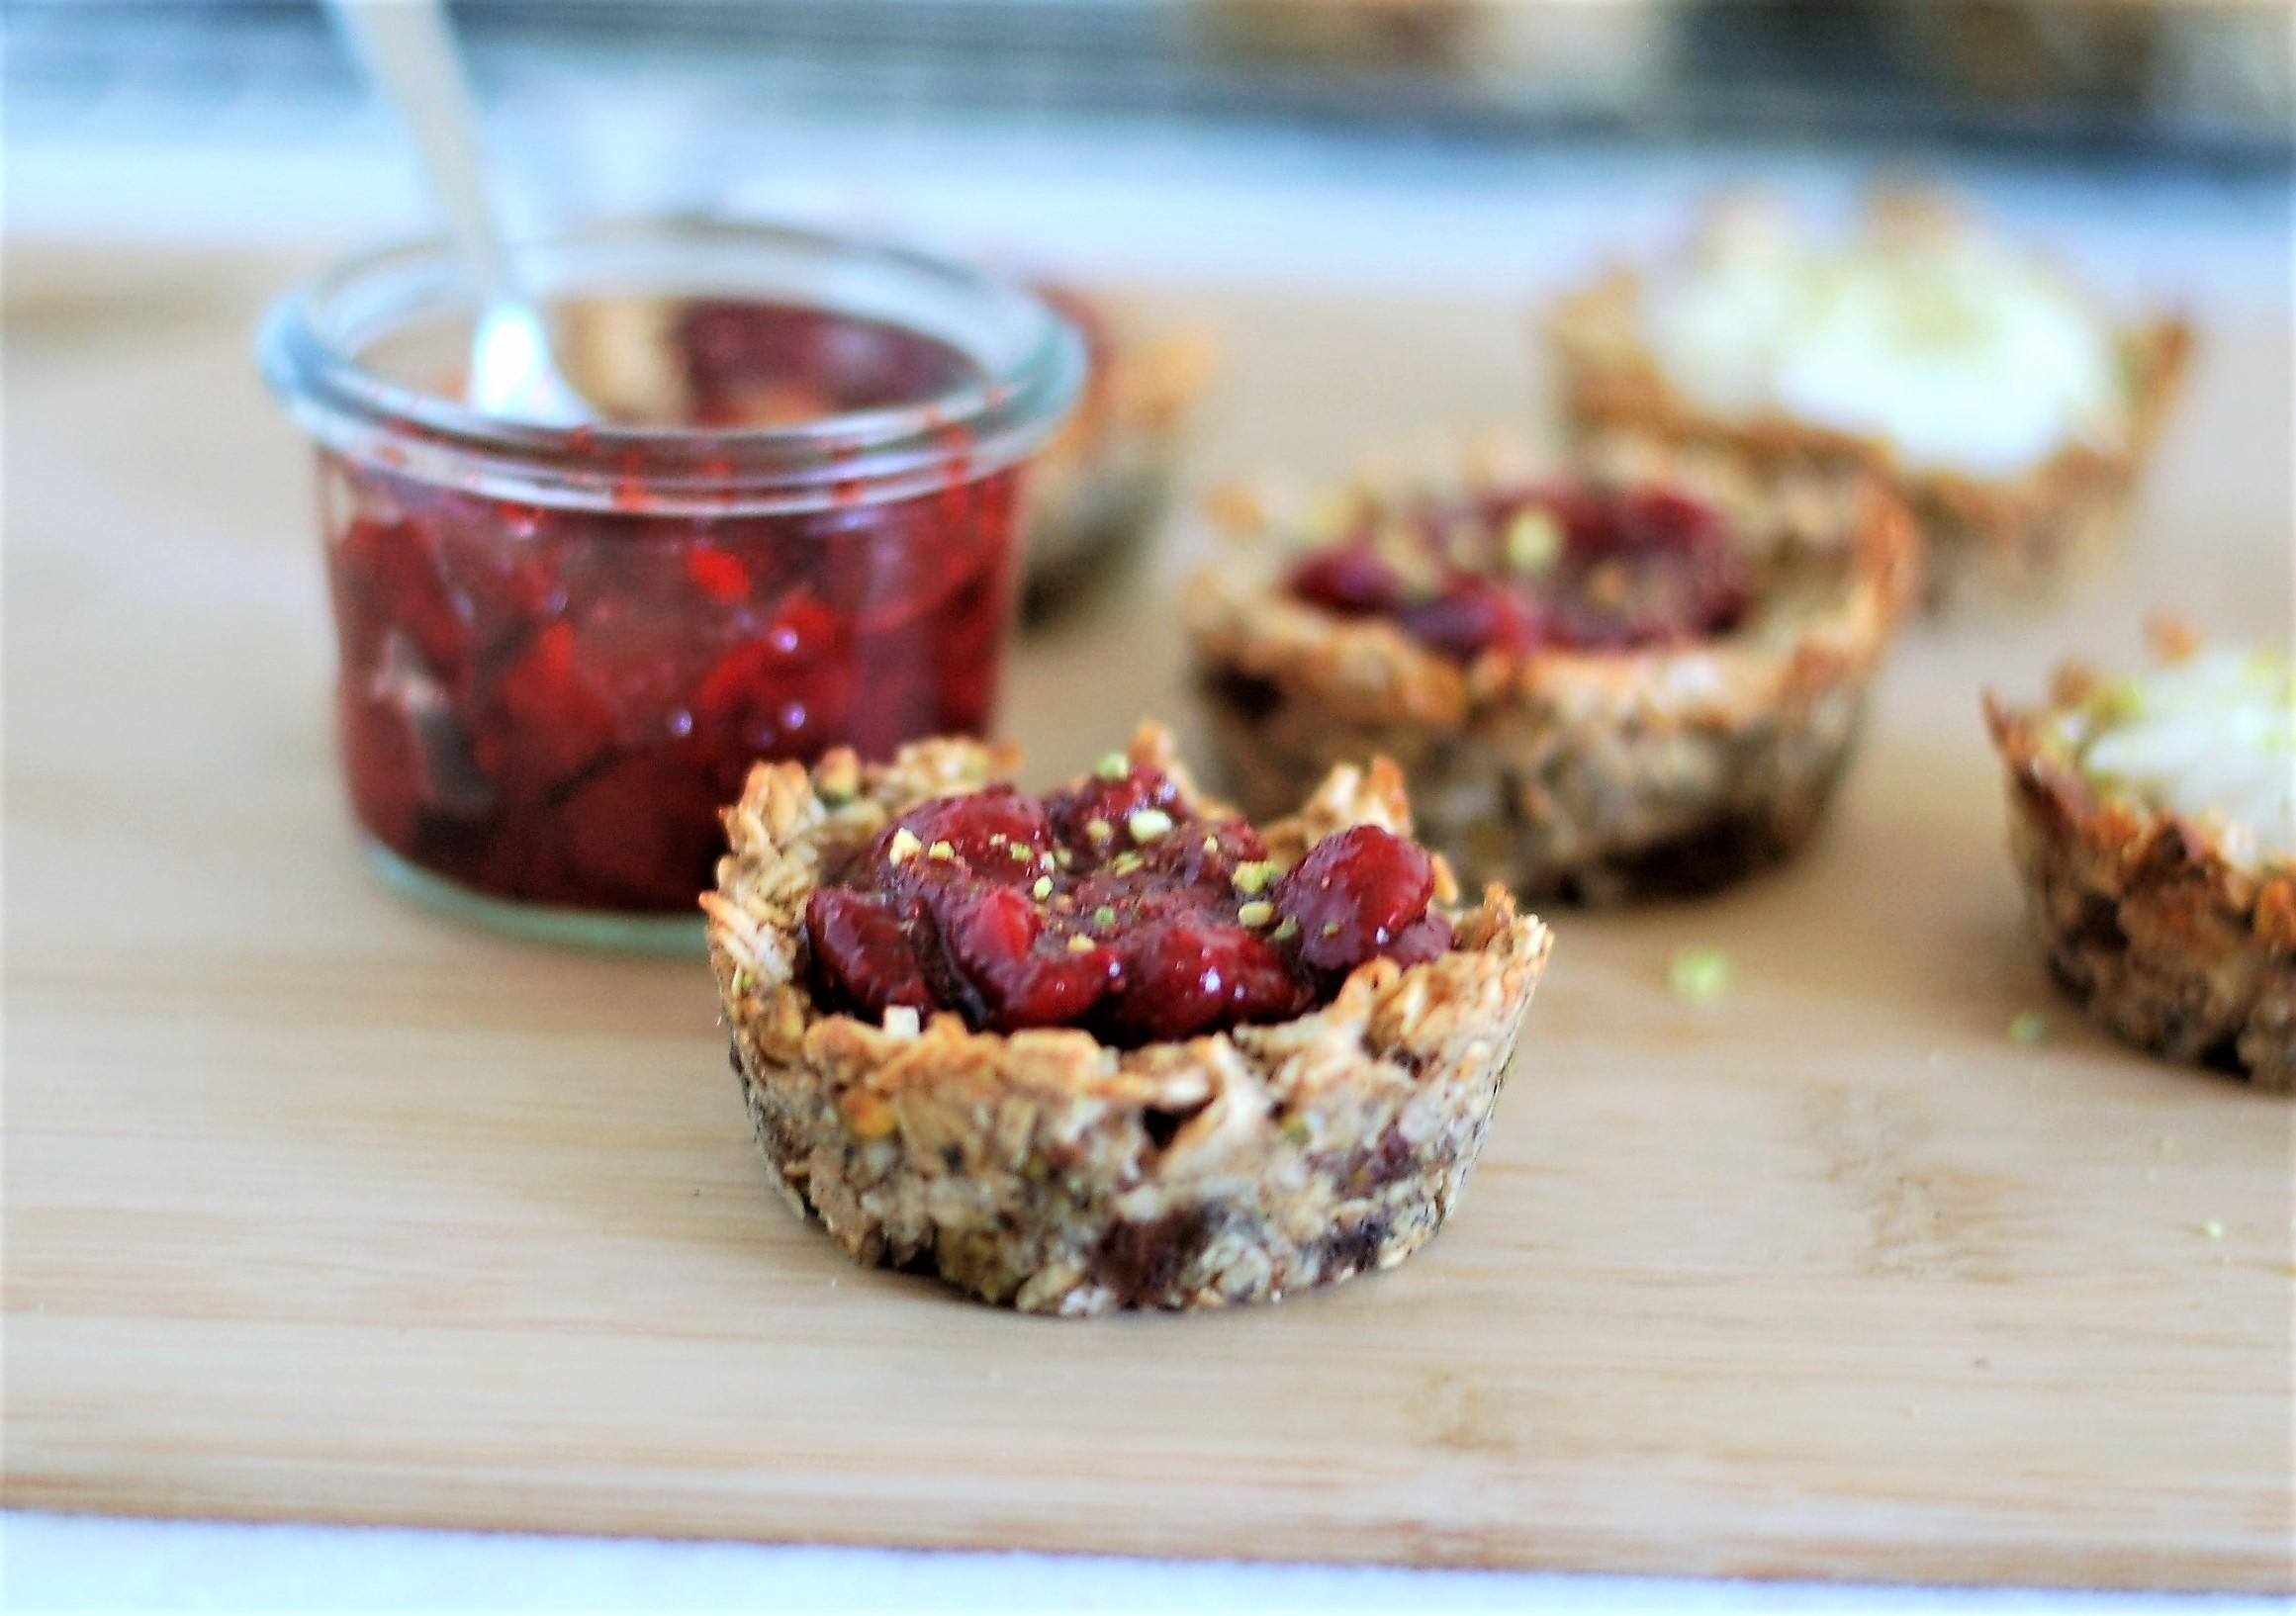 Strawberry Jam Tarts